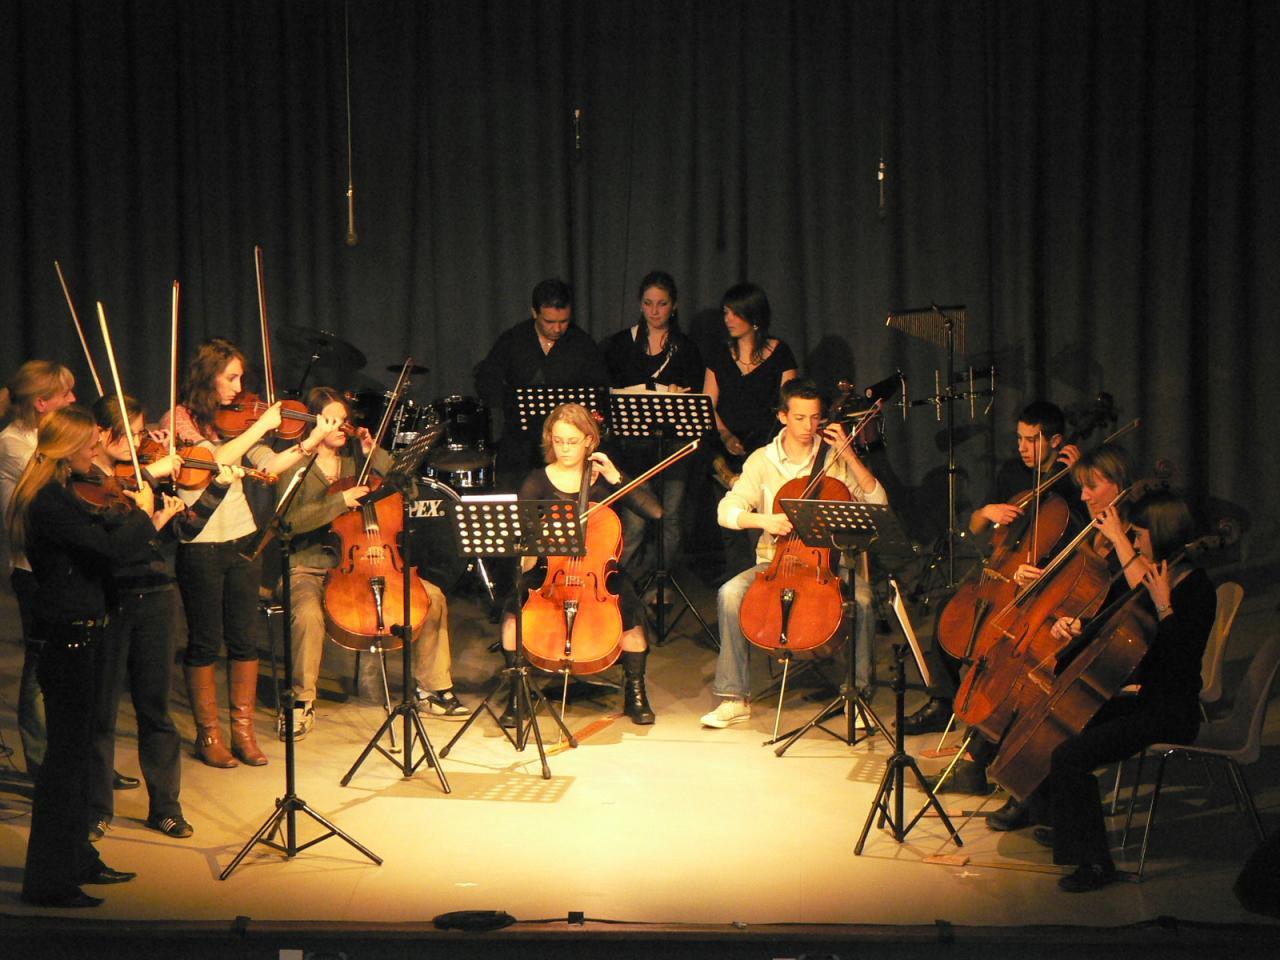 audition-de-printemps-violon-cello.jpg